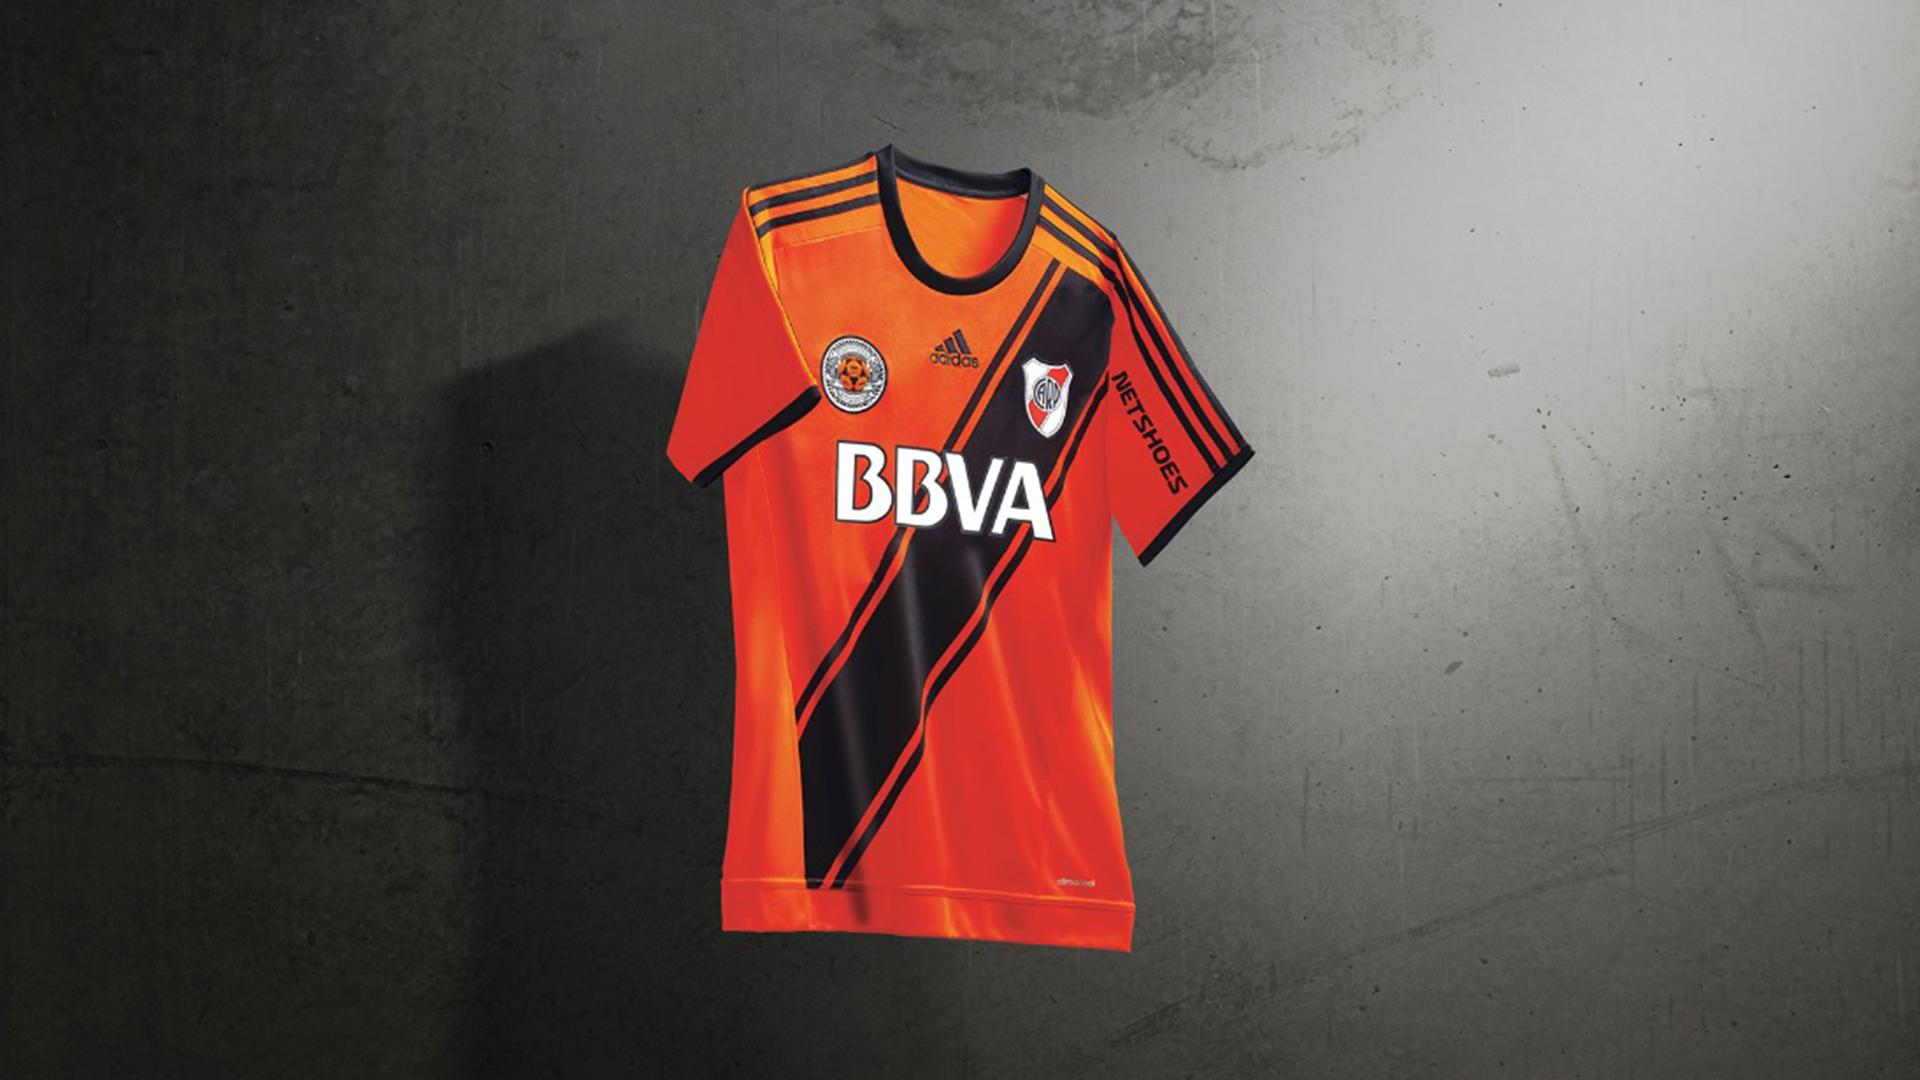 Camiseta River Naranja 2016 05042016 - Goal.com